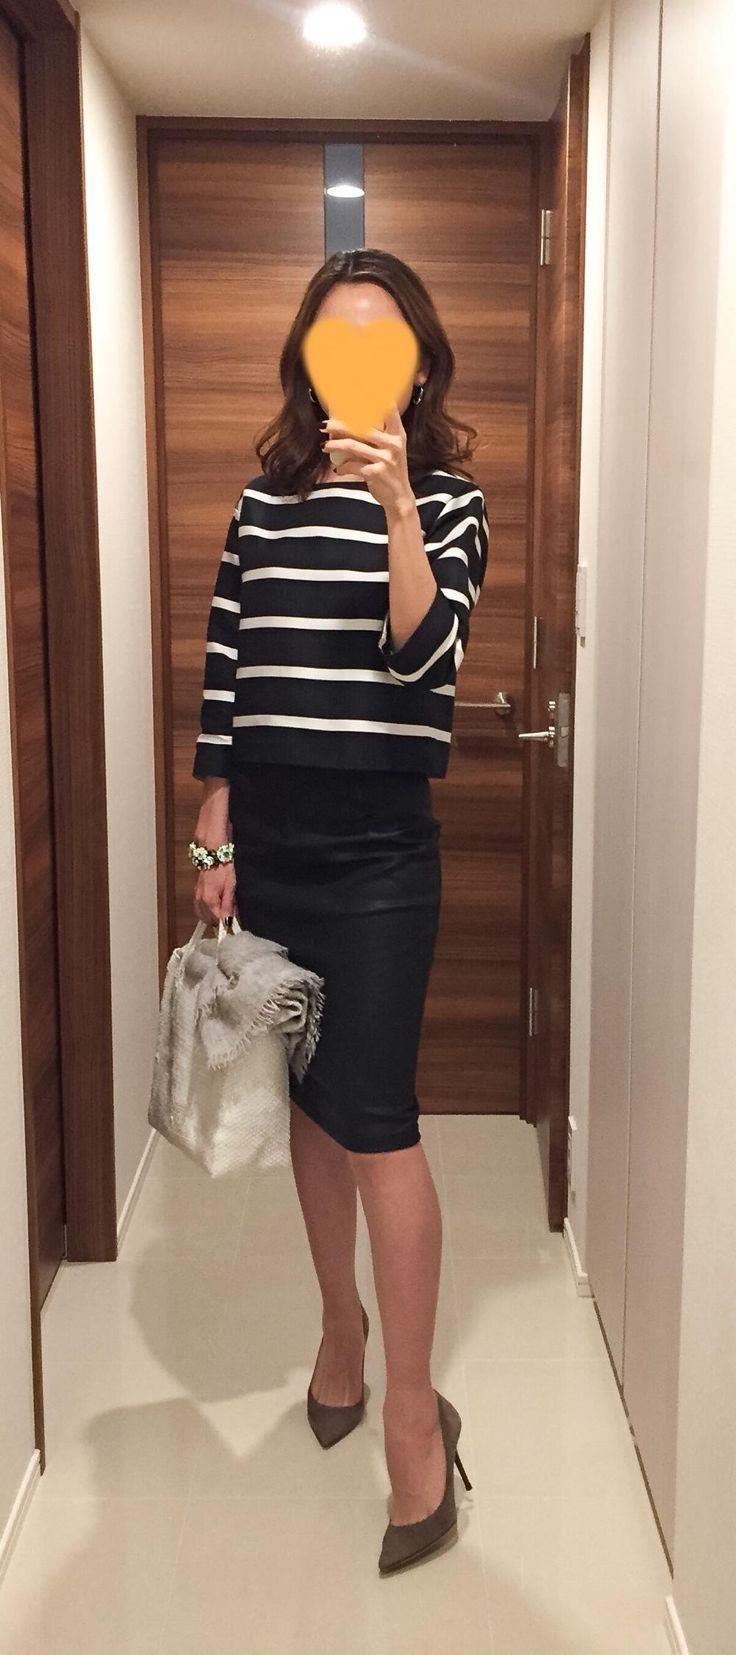 Striped tops: DRESSTERIOR, Black pencil skirt: SISLEY, White bag: la kagu, Beige heels: Jimmy Choo